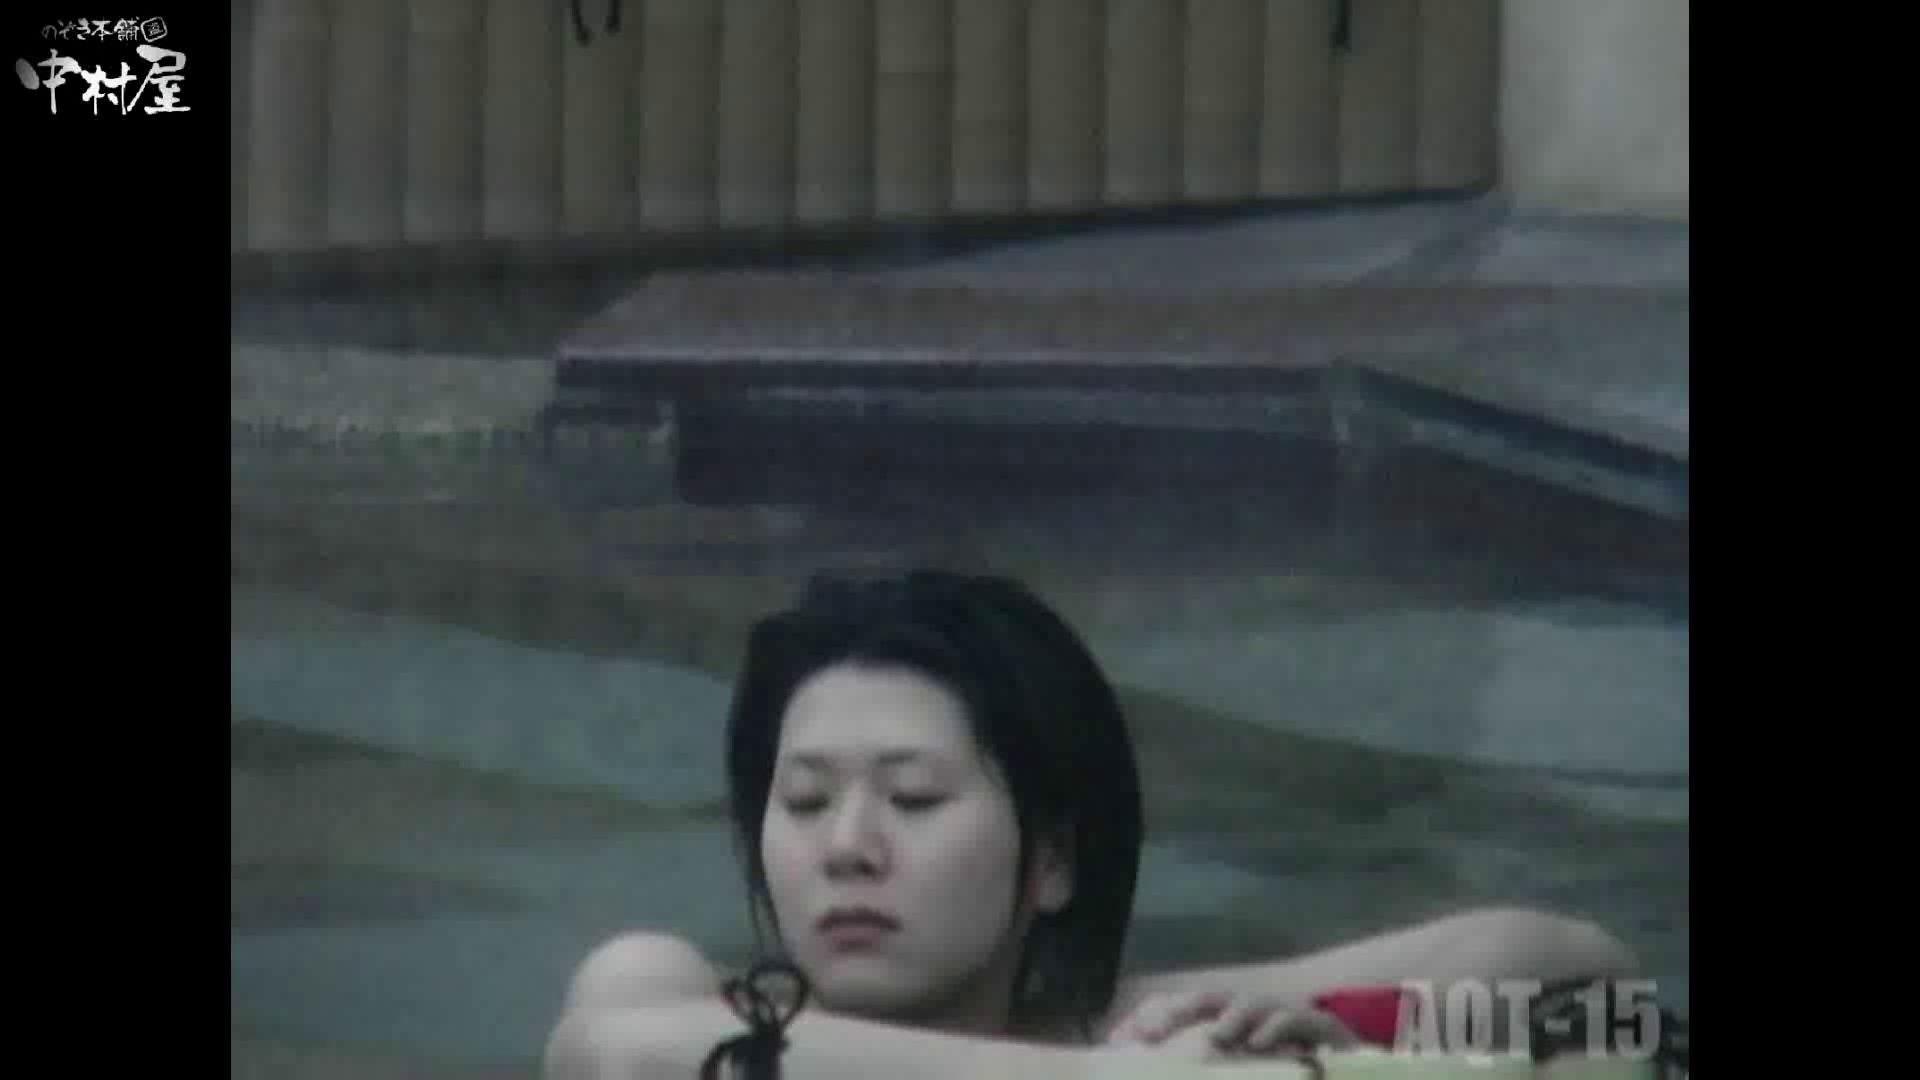 Aquaな露天風呂Vol.878潜入盗撮露天風呂十五判湯 其の七 盗撮シリーズ エロ画像 97PIX 68